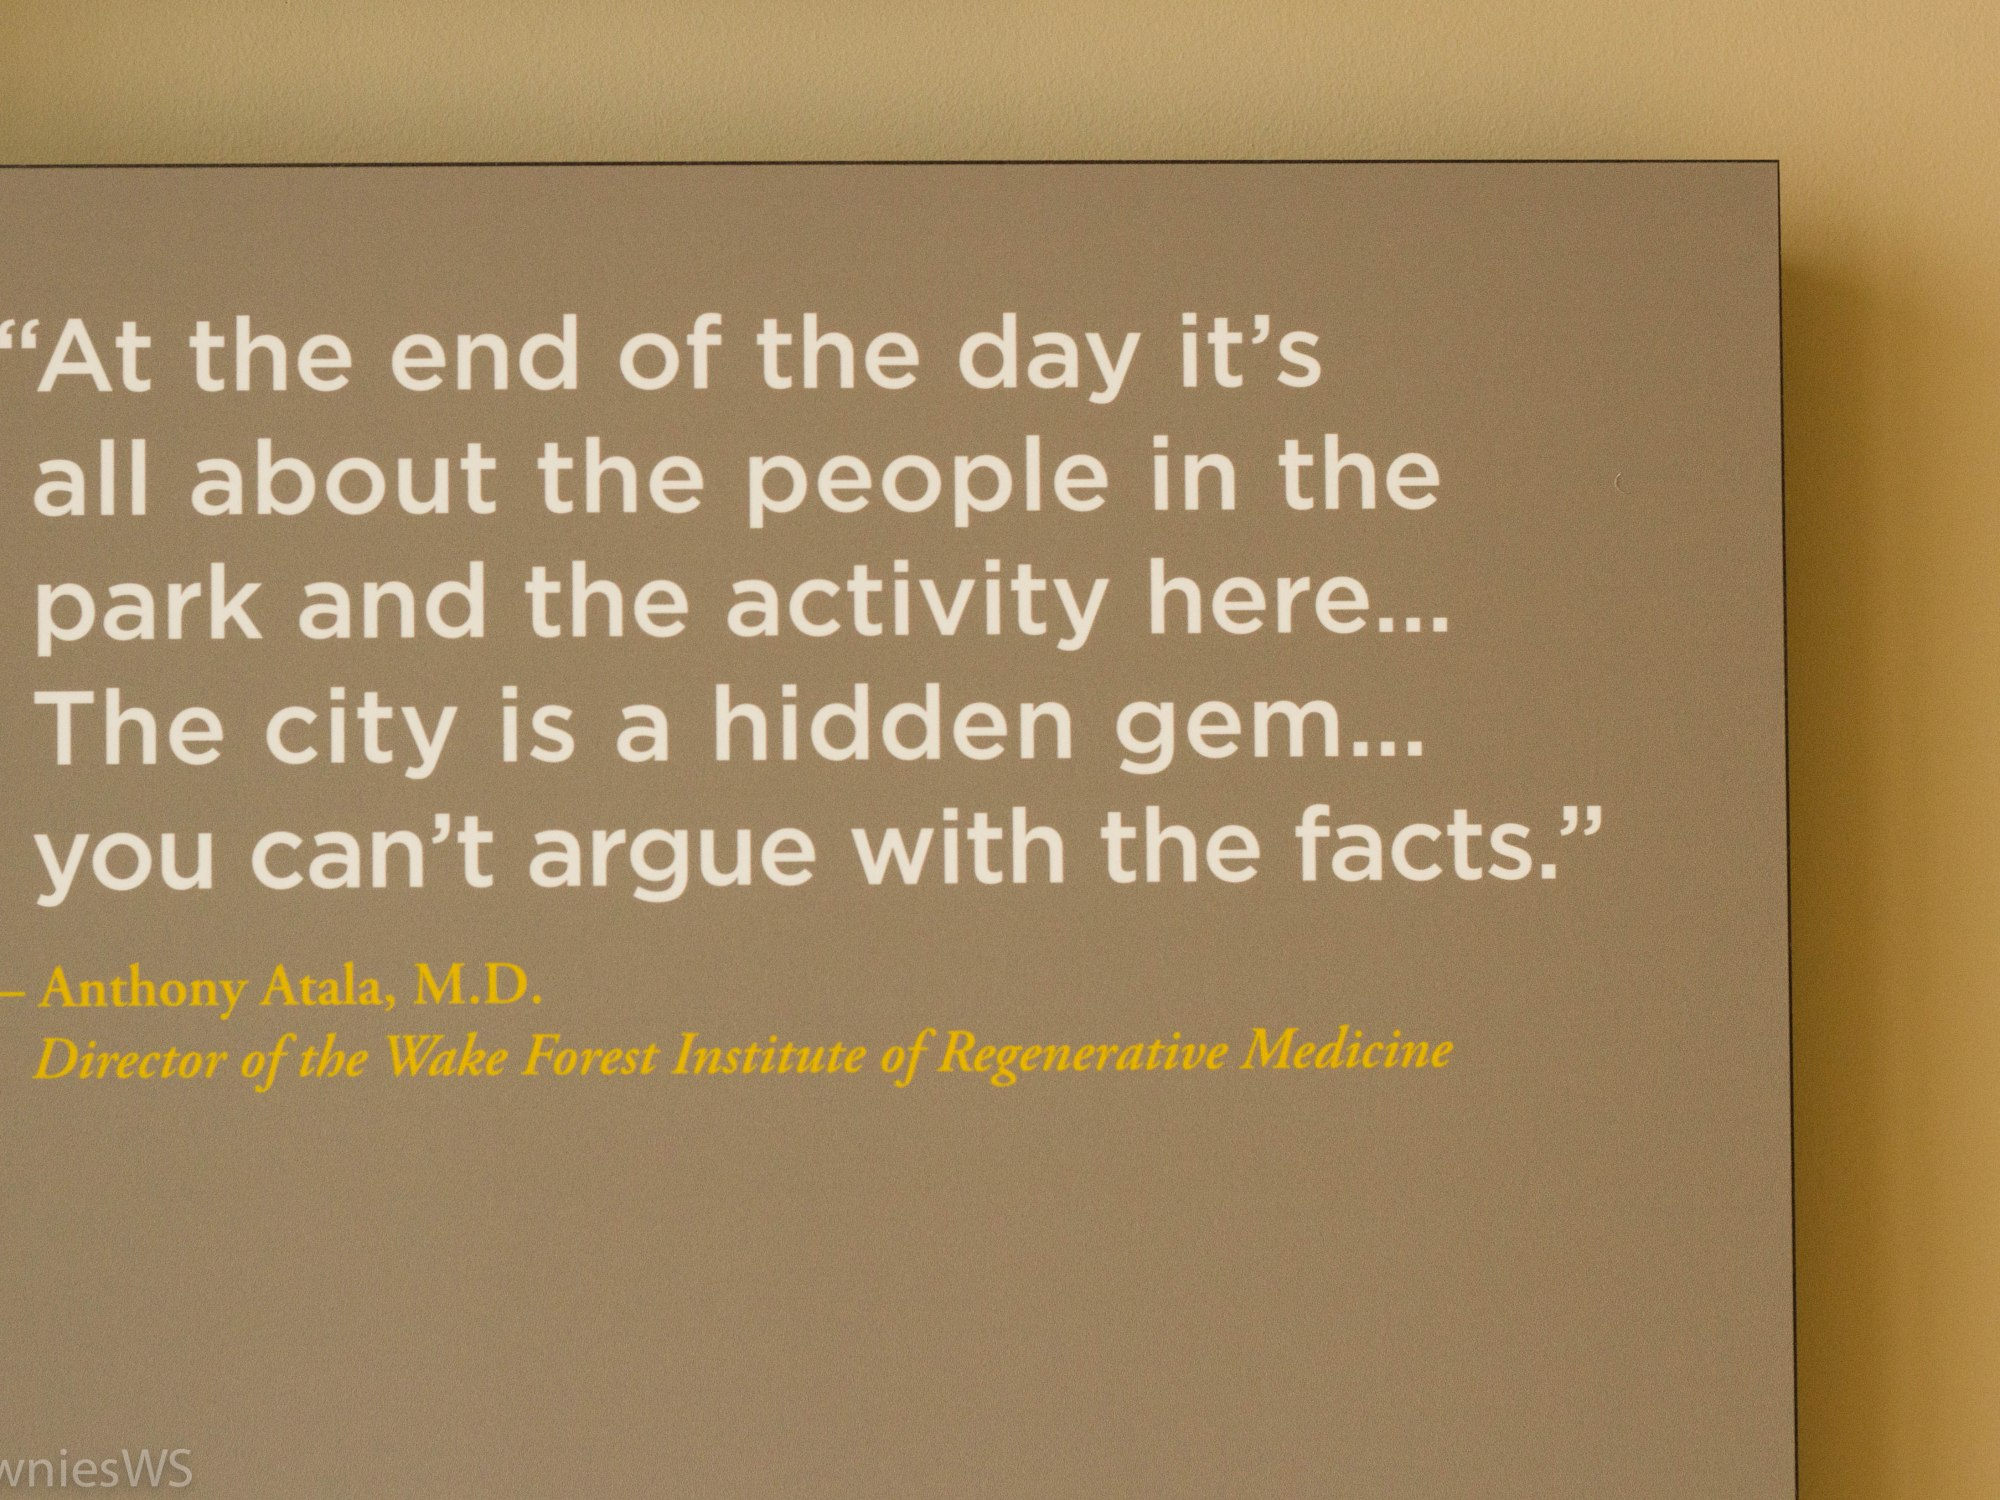 Dr. Anthony Atala, Winston-Salem, TowniesWS.com